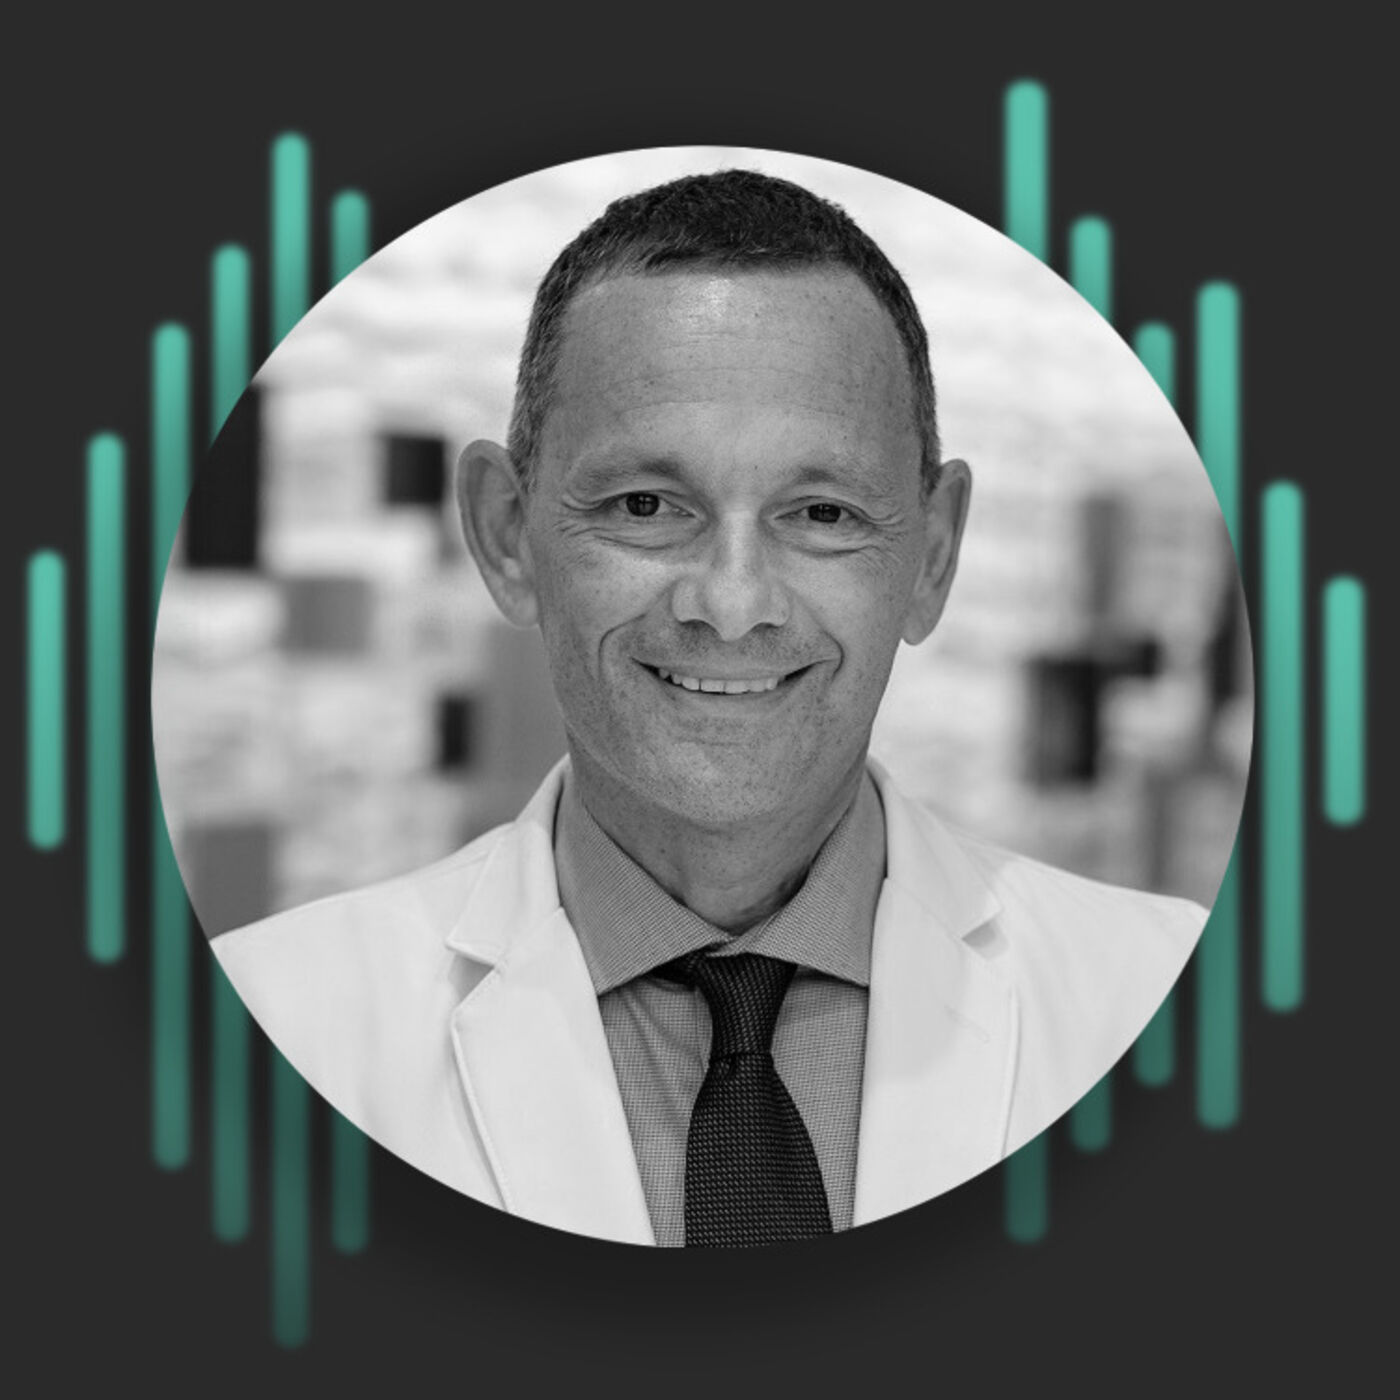 Episode 5: David Elkowitz D.O. Pathologist and Dean